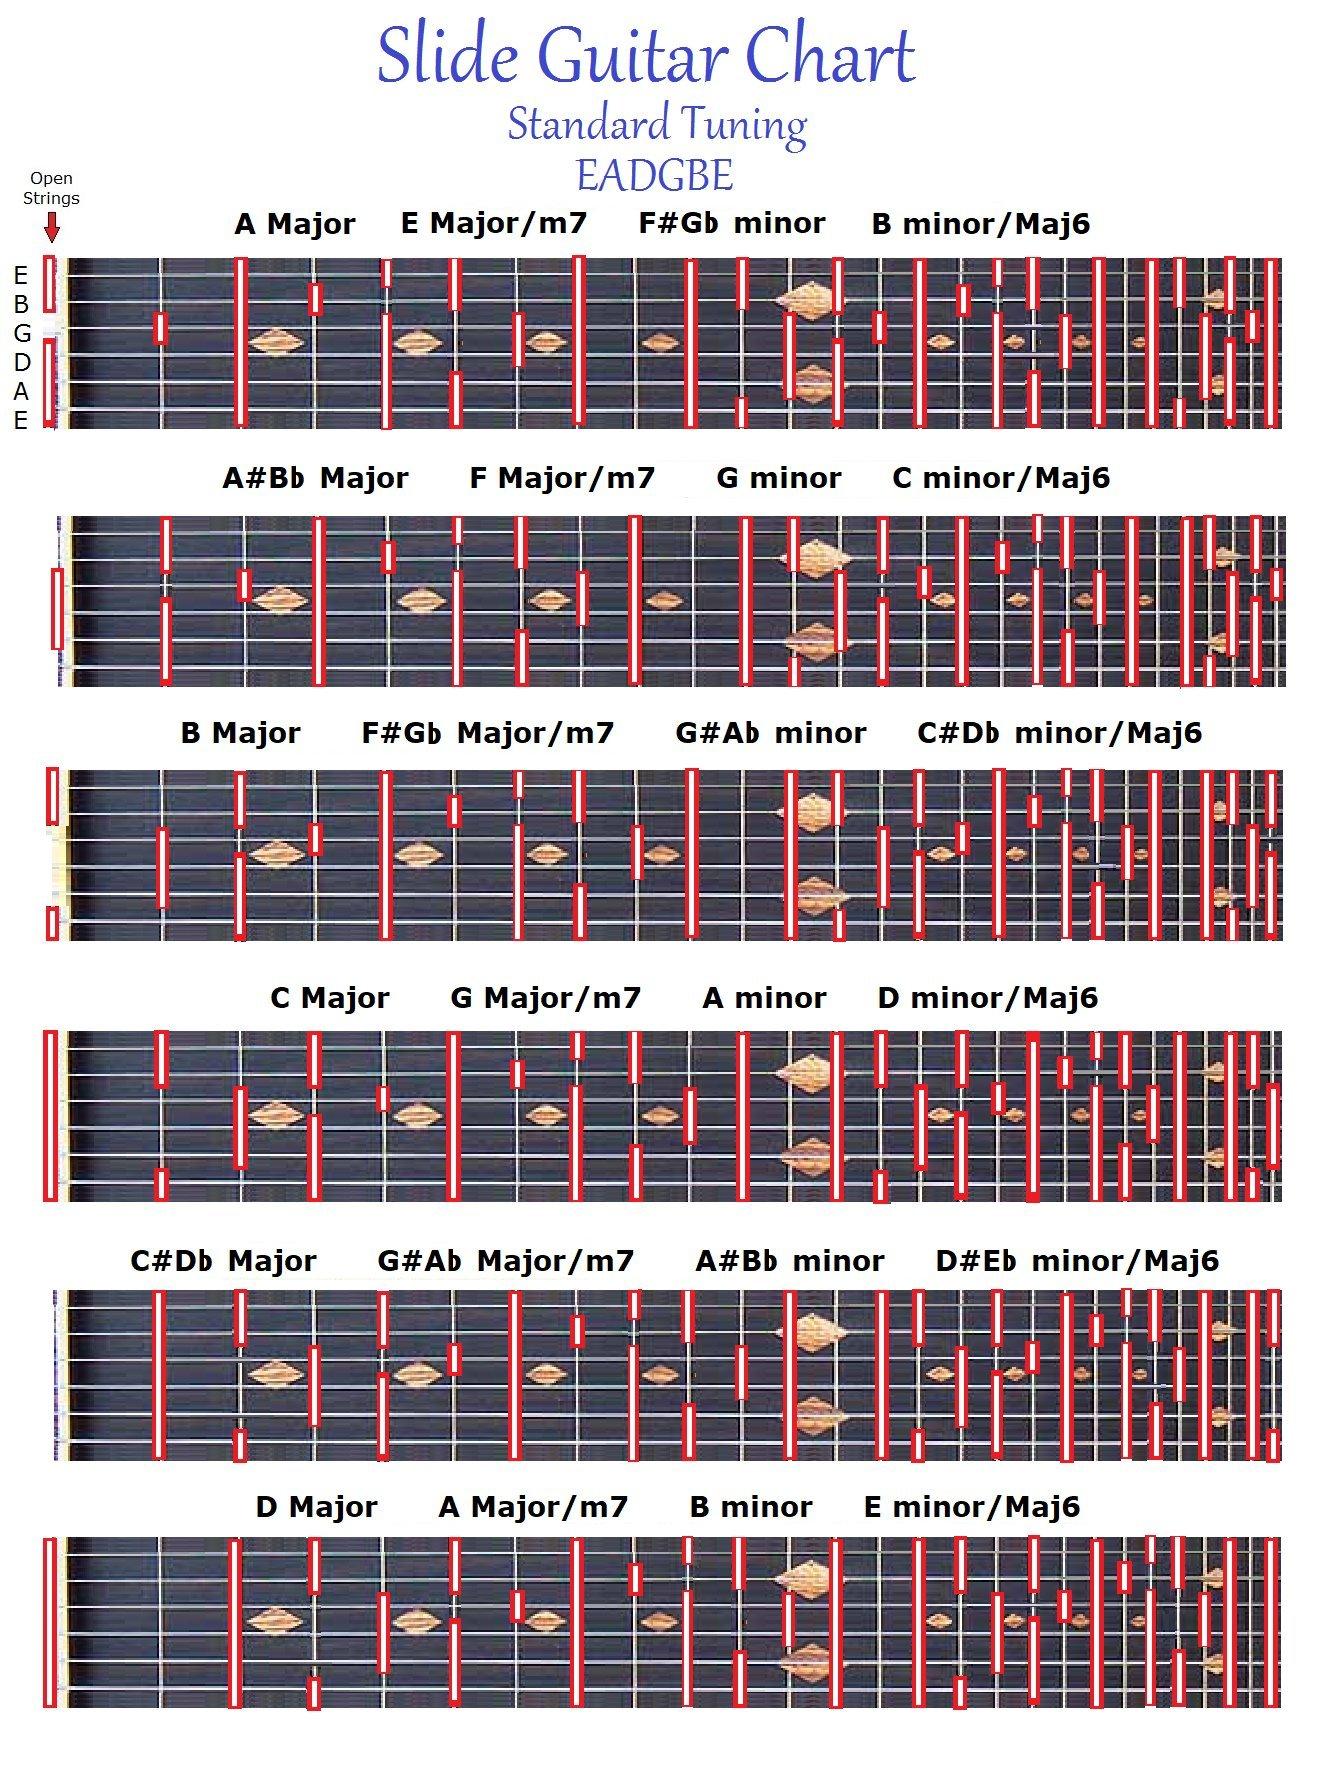 SLIDE GUITAR CHART - STANDARD TUNING EADGBE